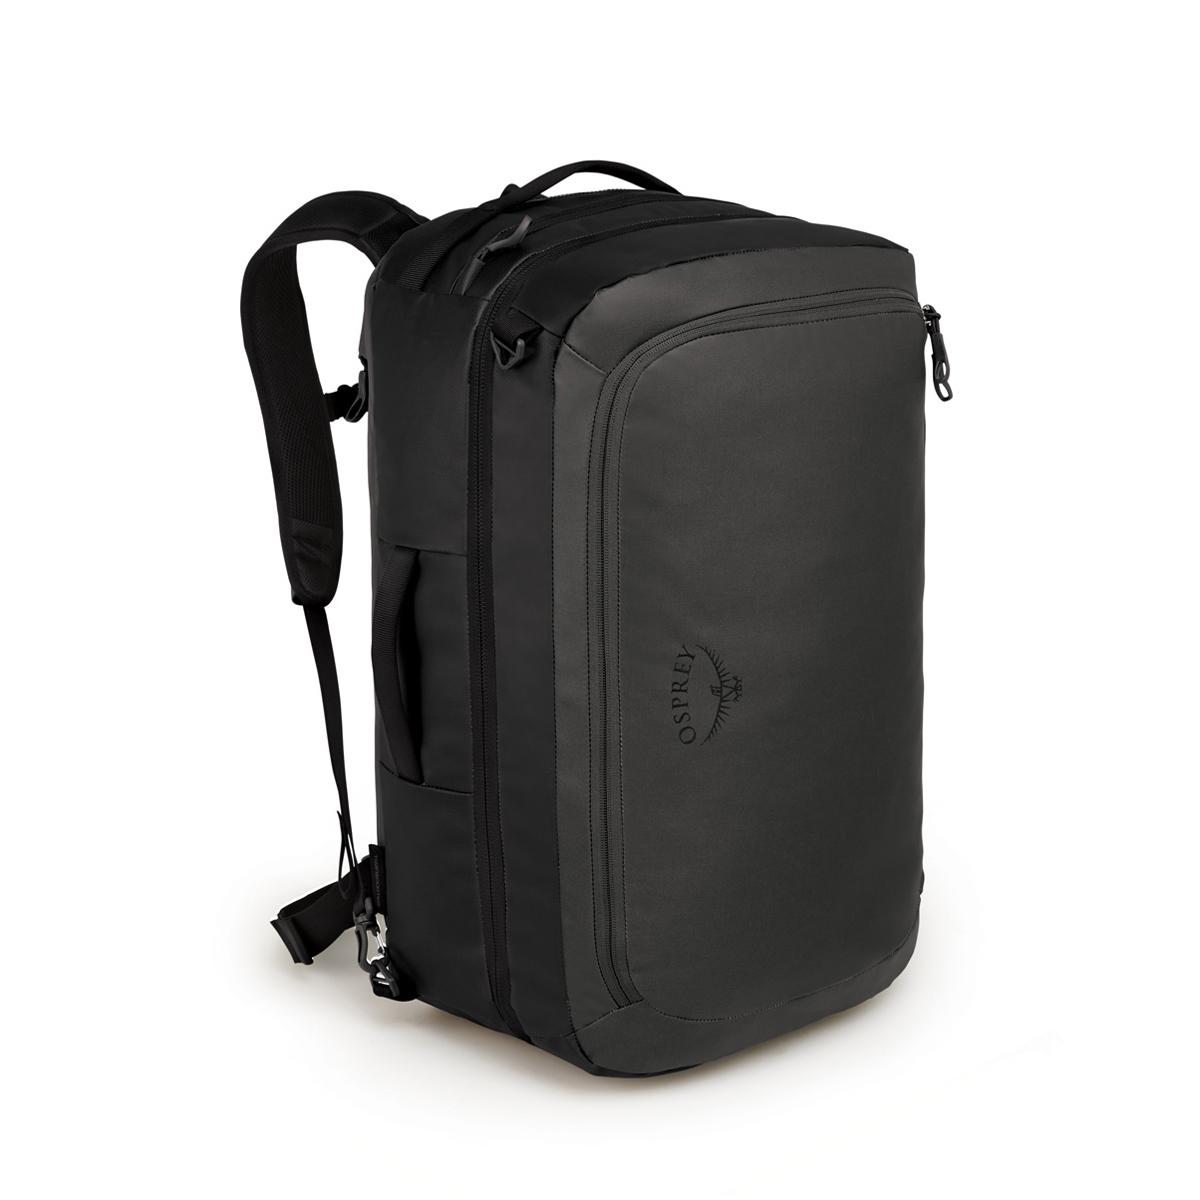 OSPREY オスプレー トランスポーター キャリーオン 44L ブラック OS55160 (P10)ノートパソコン対応スリーブ(15インチ)